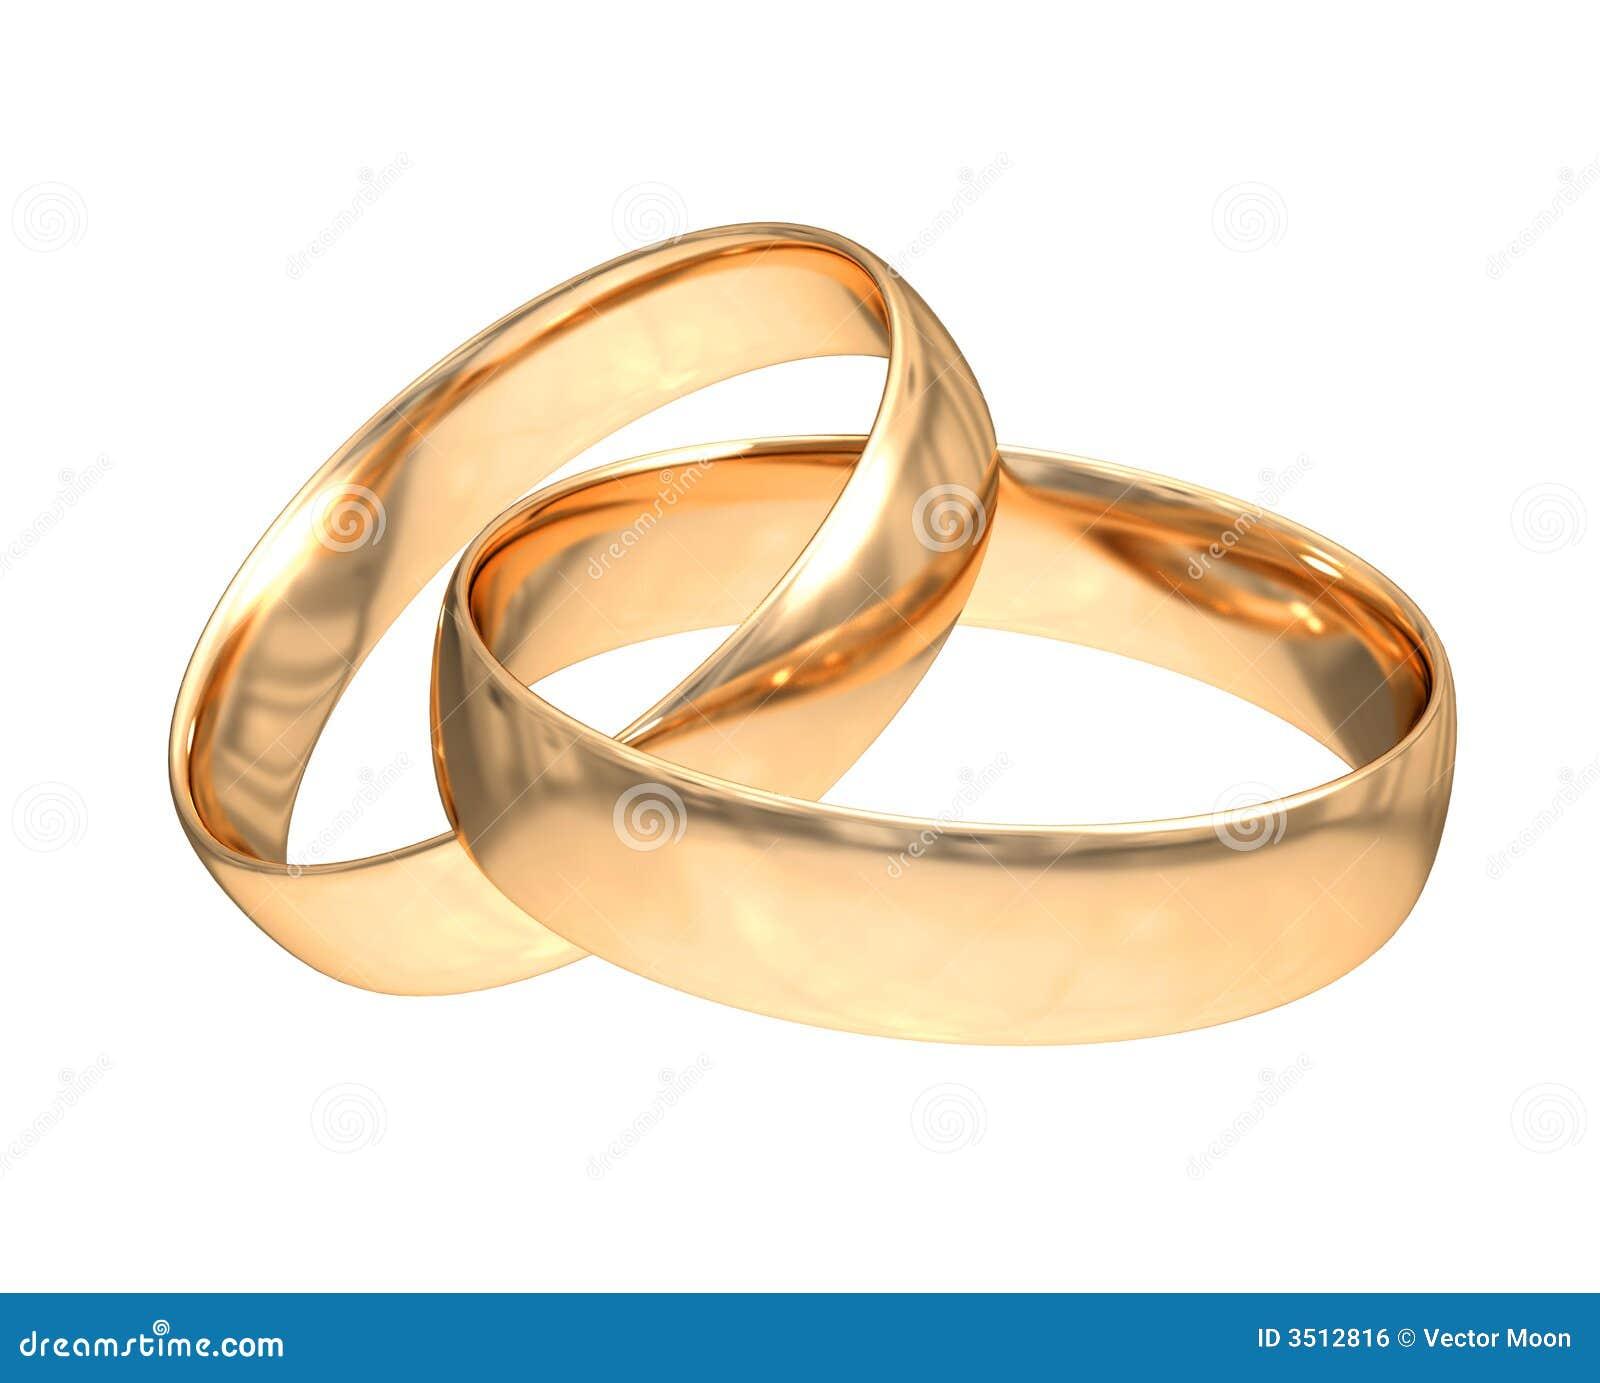 Wedding Gold Rings On White Royalty Free Stock Image